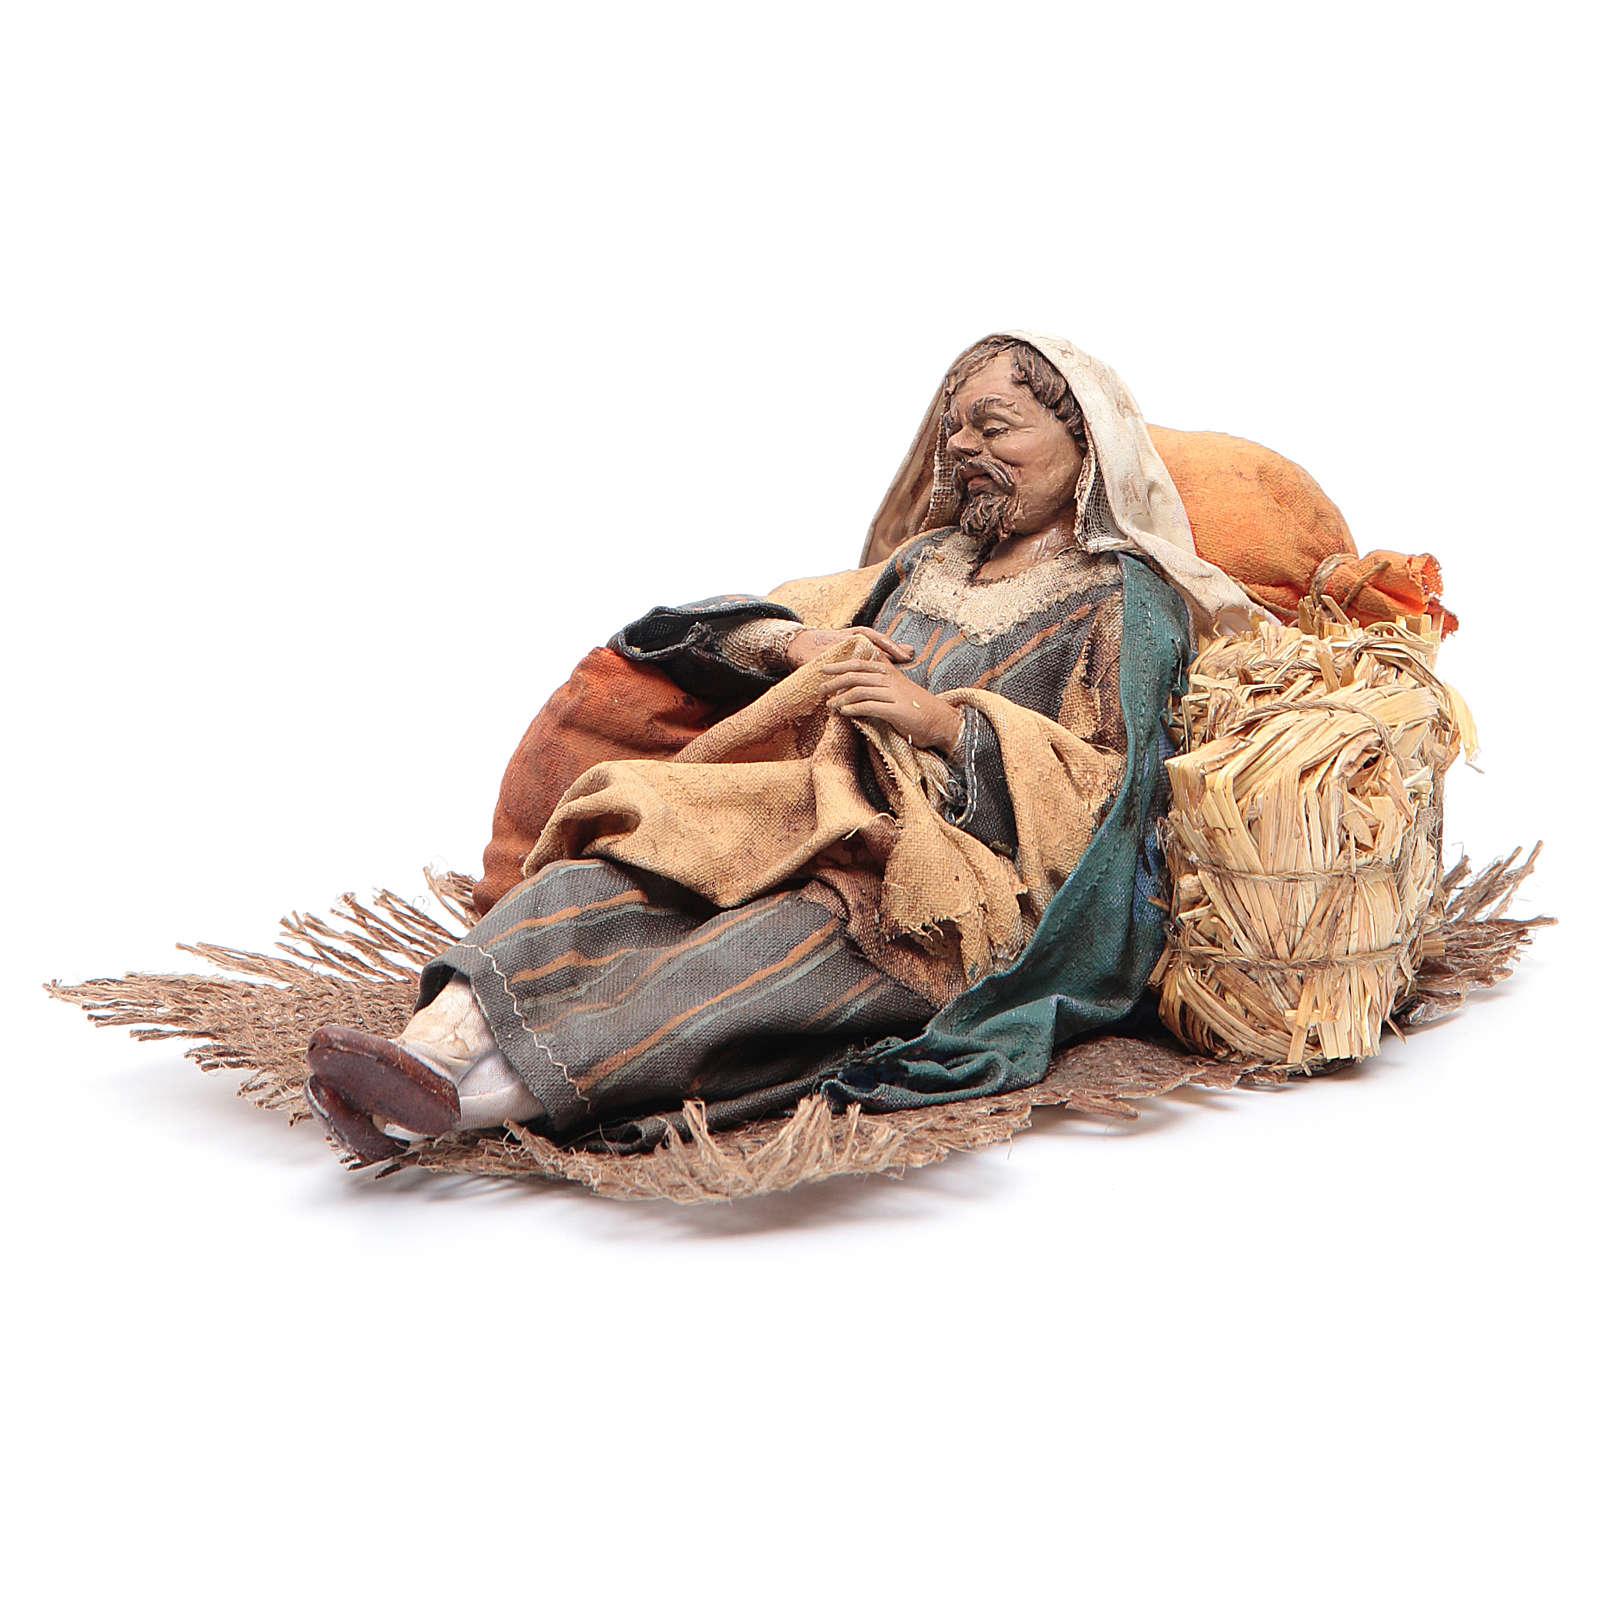 Pastore dormiente seduto 18 cm Angela Tripi 4